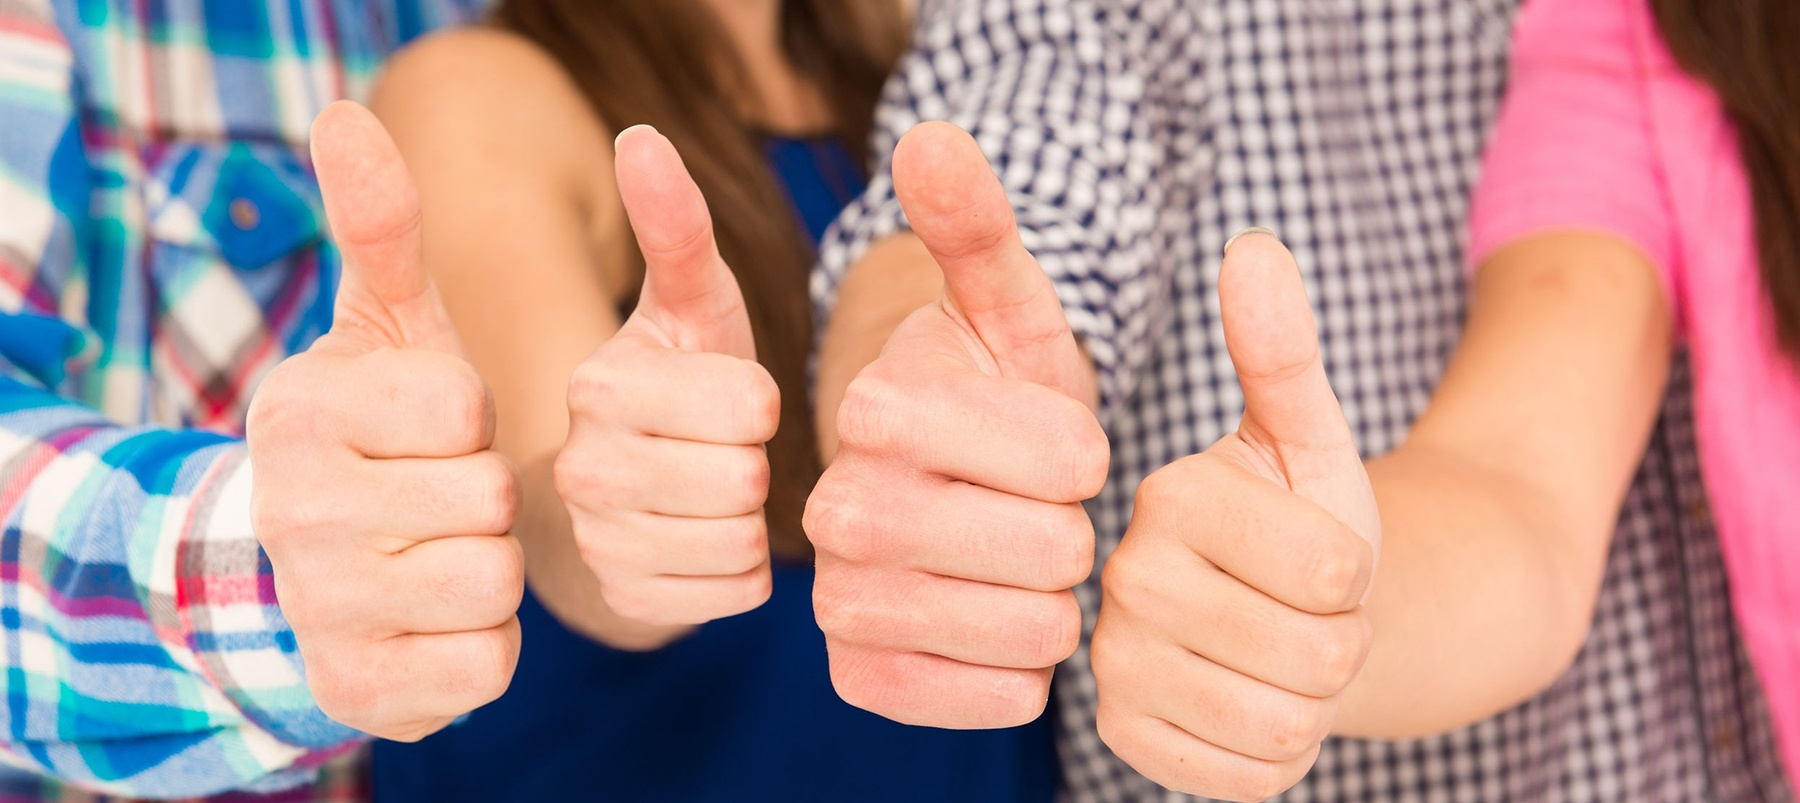 thumbs-up-1800px.jpg